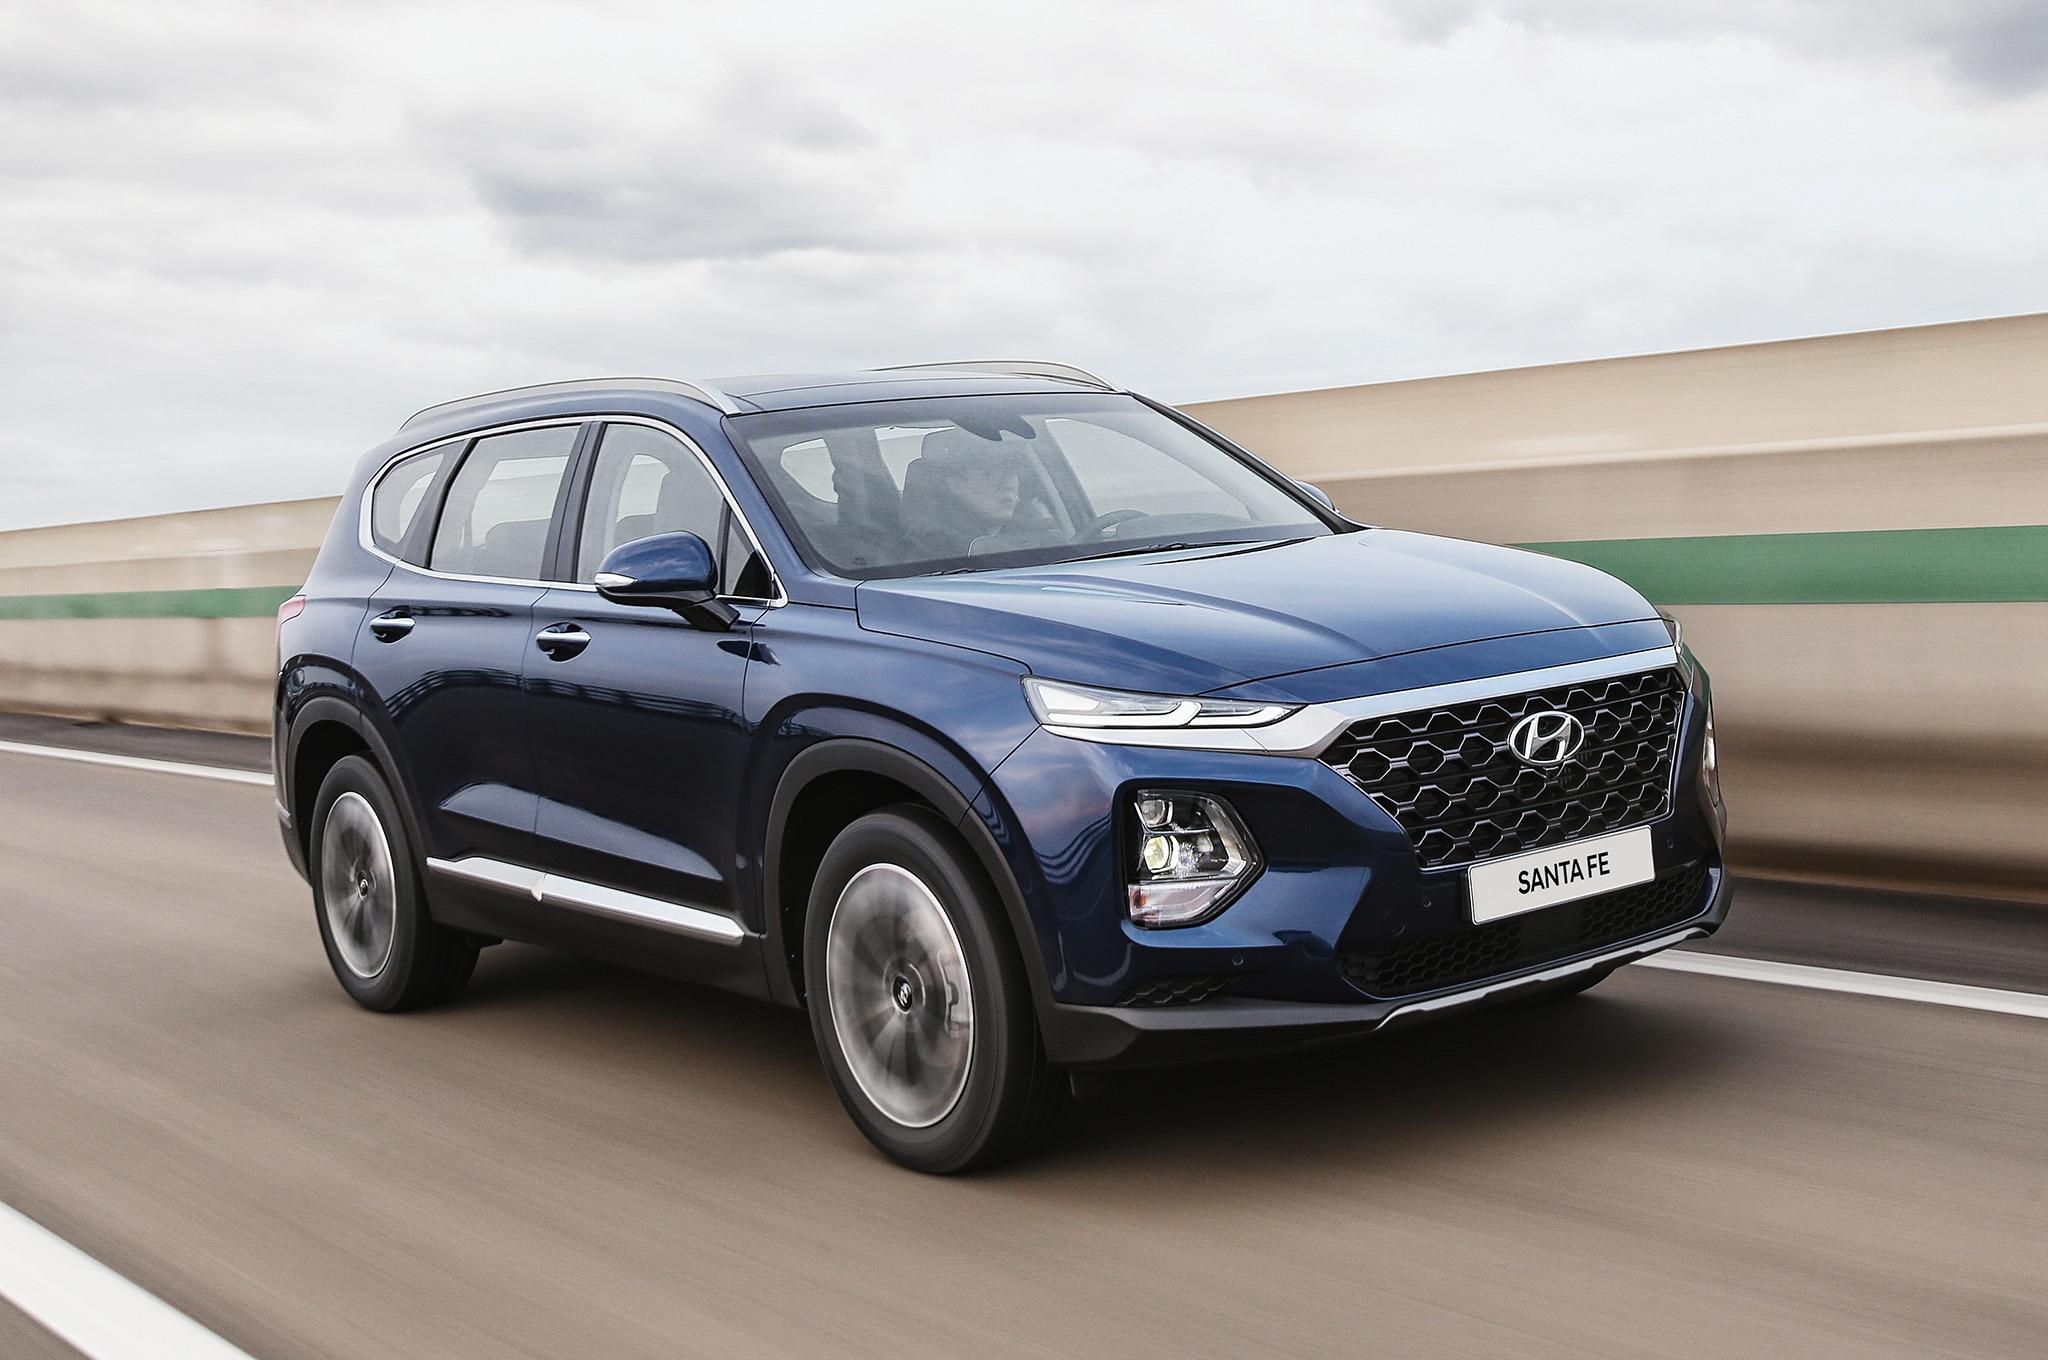 2019 Hyundai Santa Fe Korean Market Front Three Quarter In Motion 6